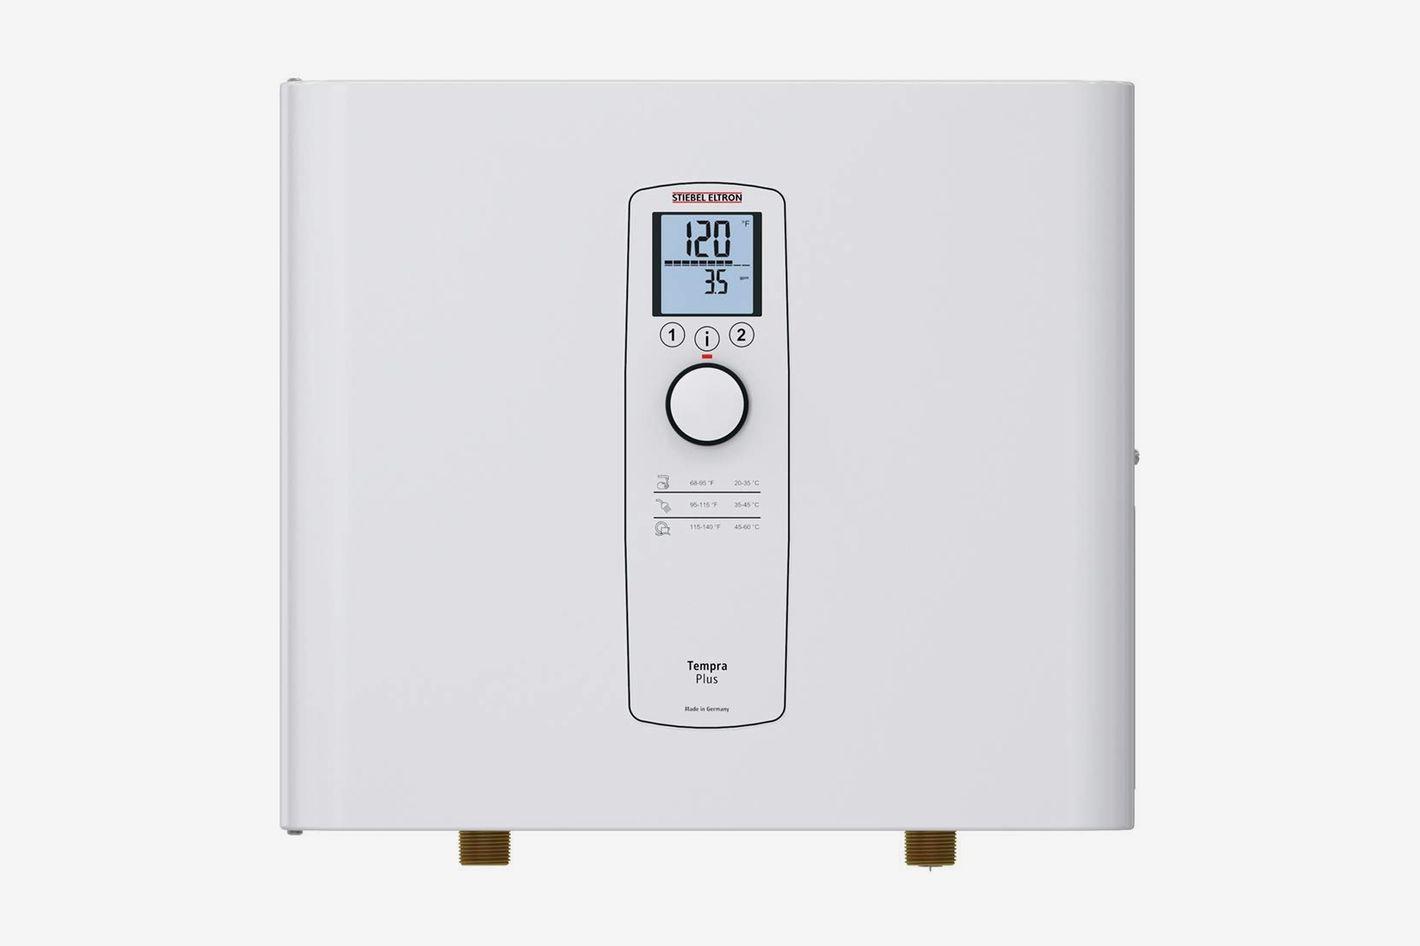 stiebel eltron water heater reviews